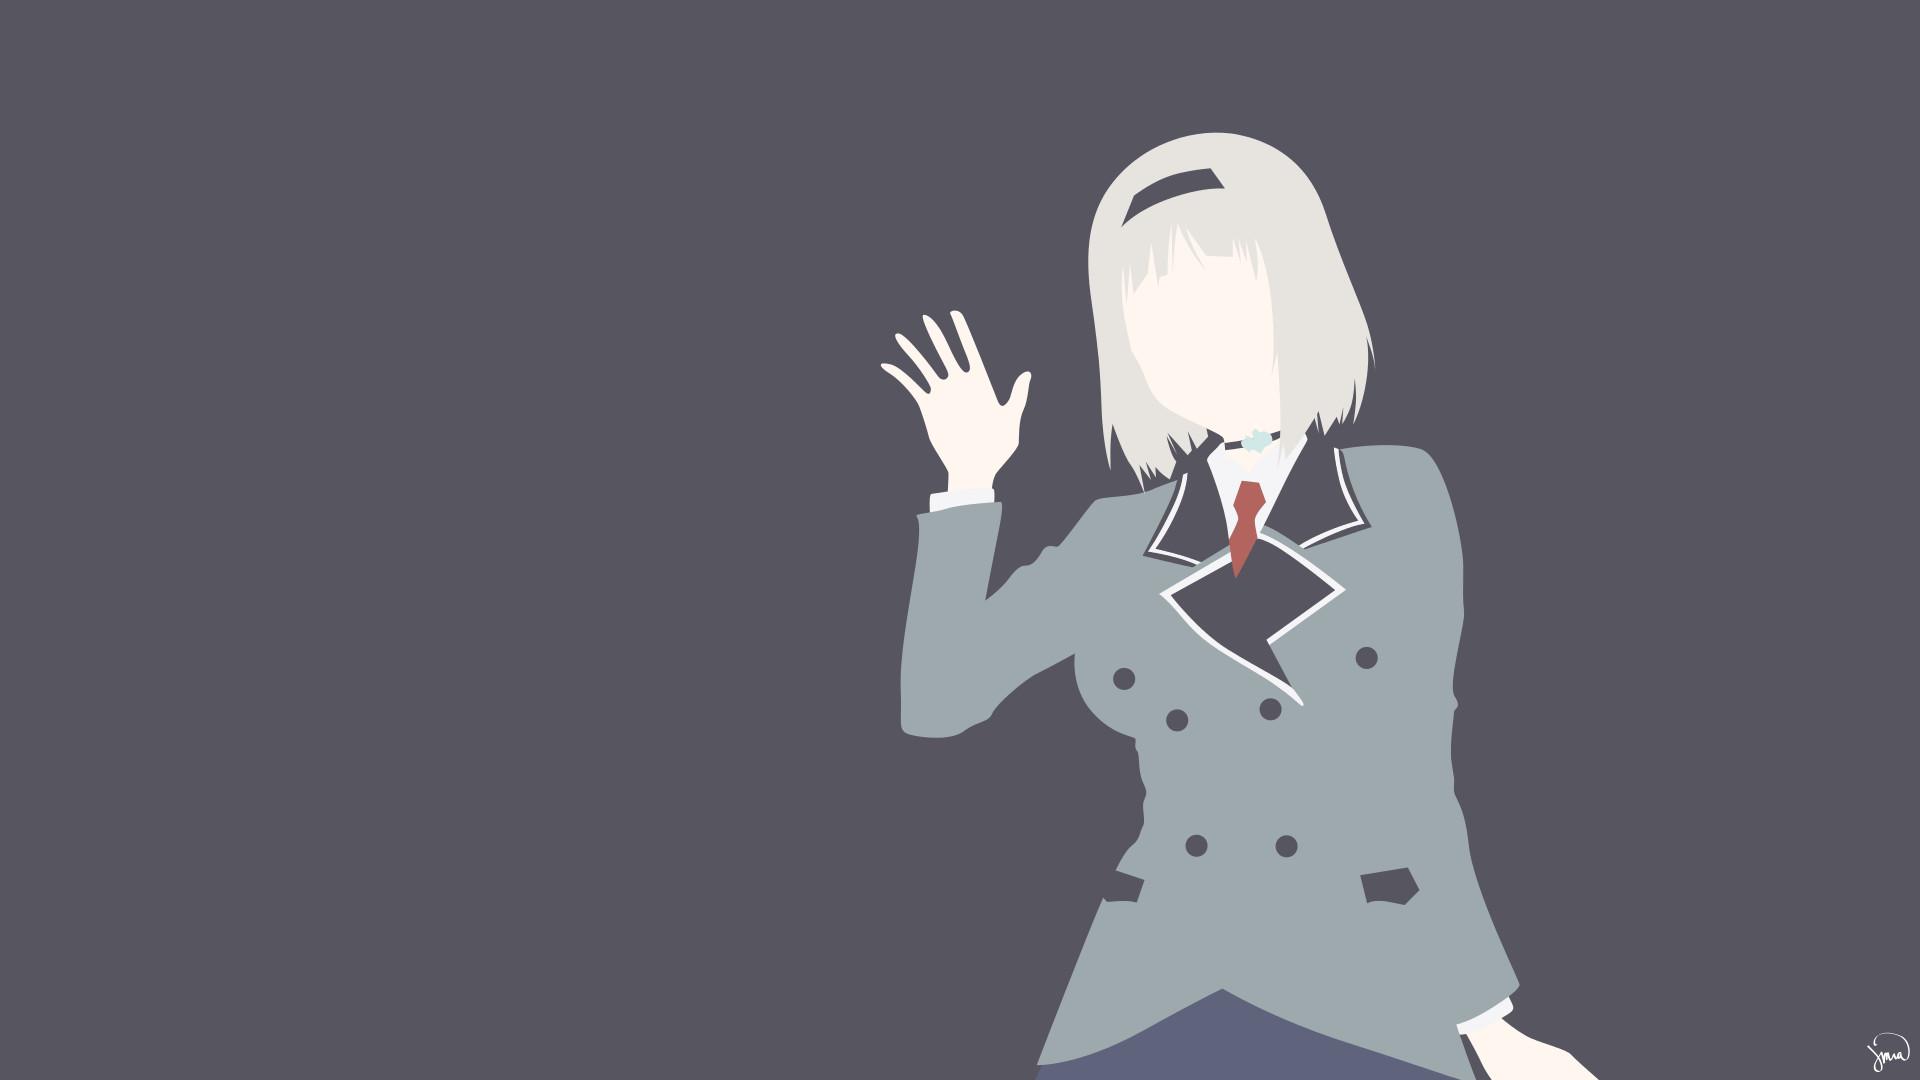 Illüstrasyon Anime Anime girls karikatür Shimoneta Nishikinomiya Anna el  parmak